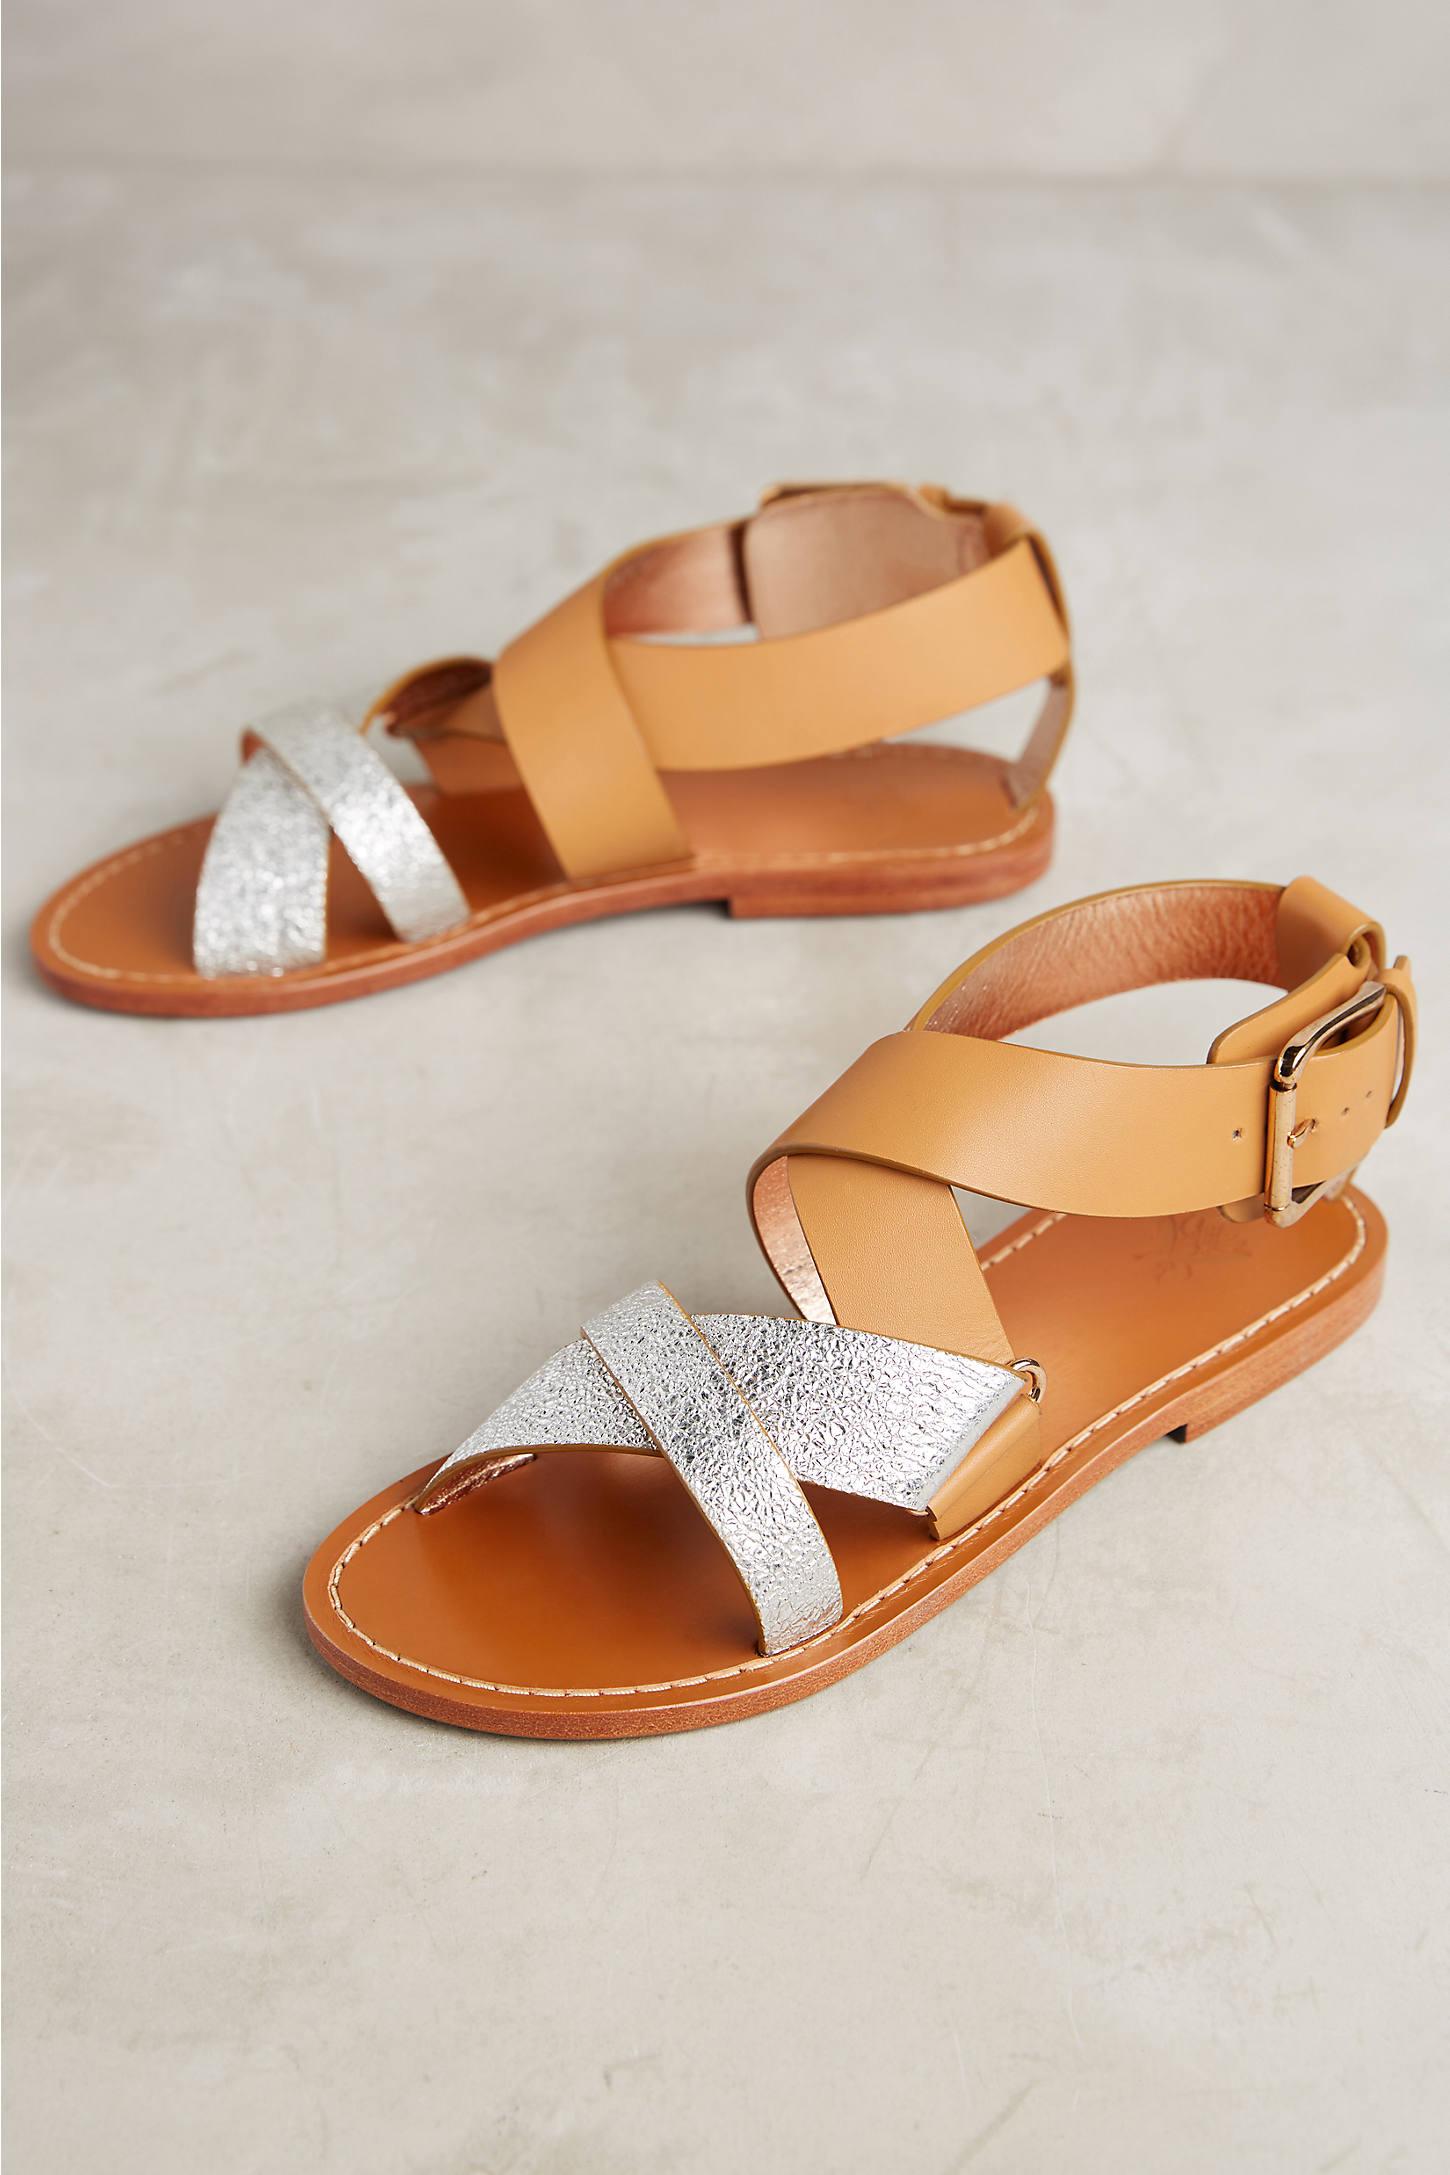 Sanchita Coelia Crossed Metallic Sandals